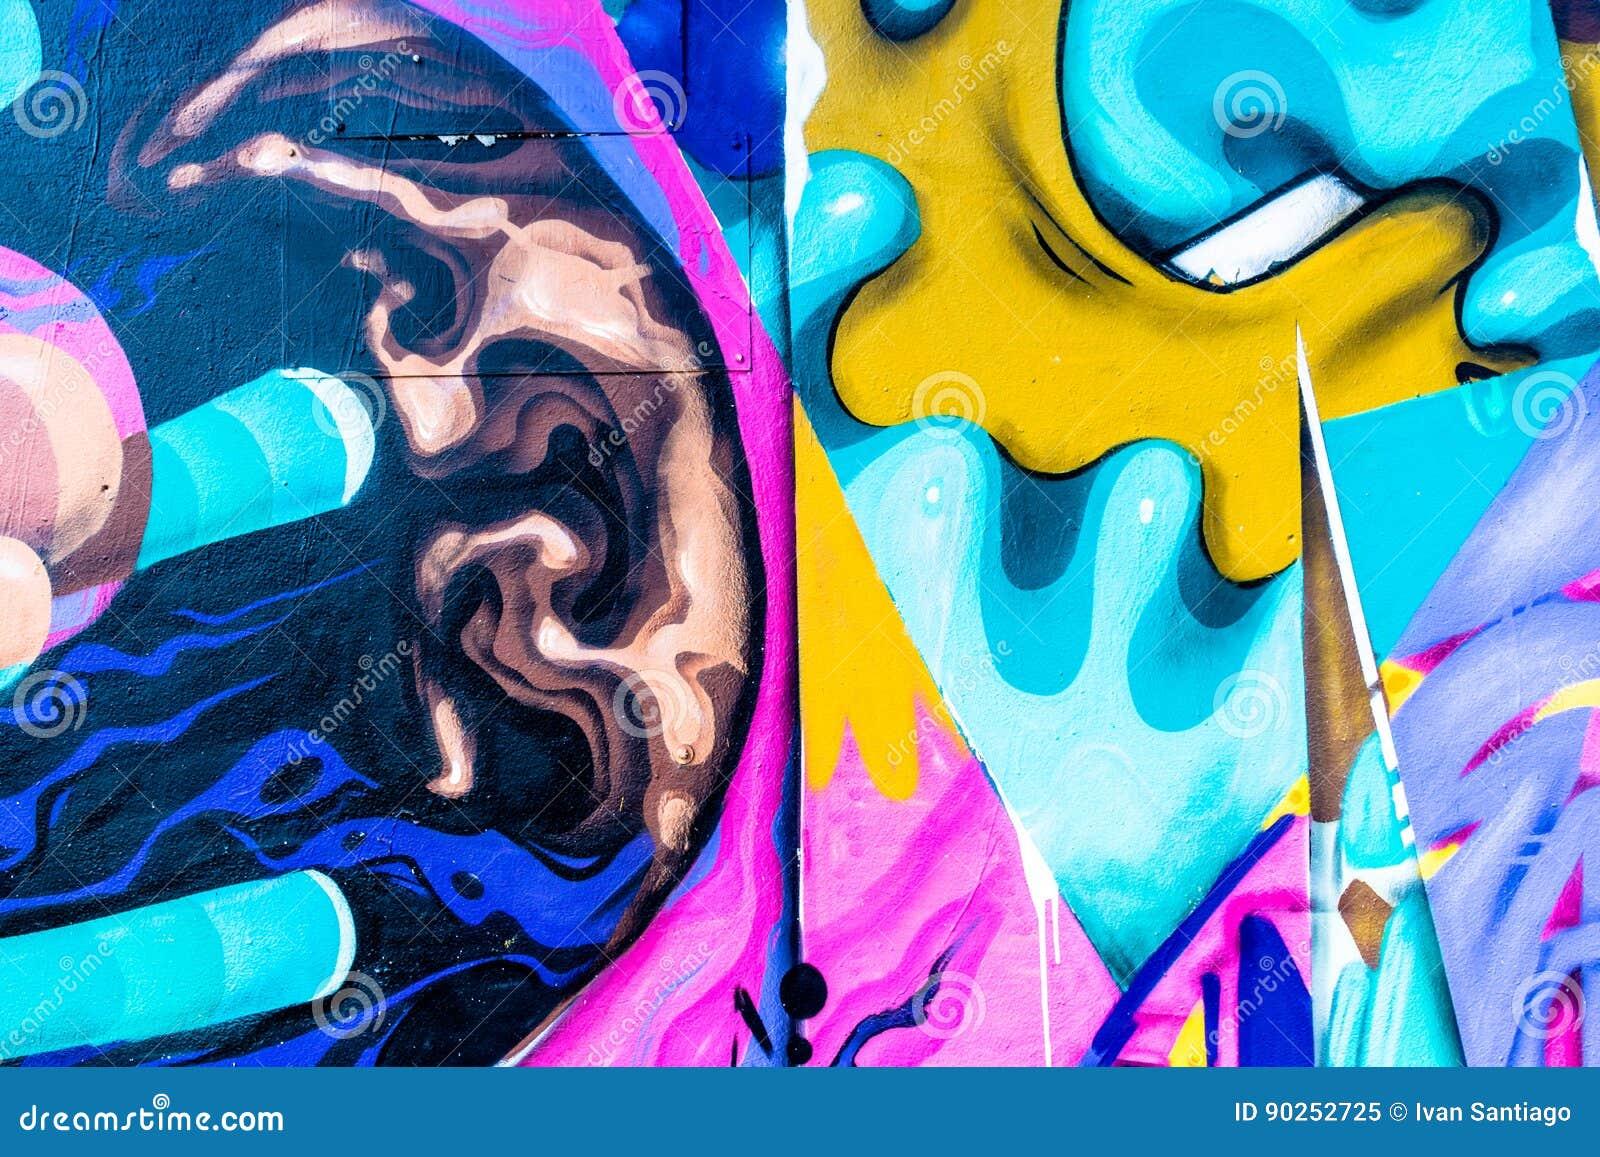 Mundo dos grafittis